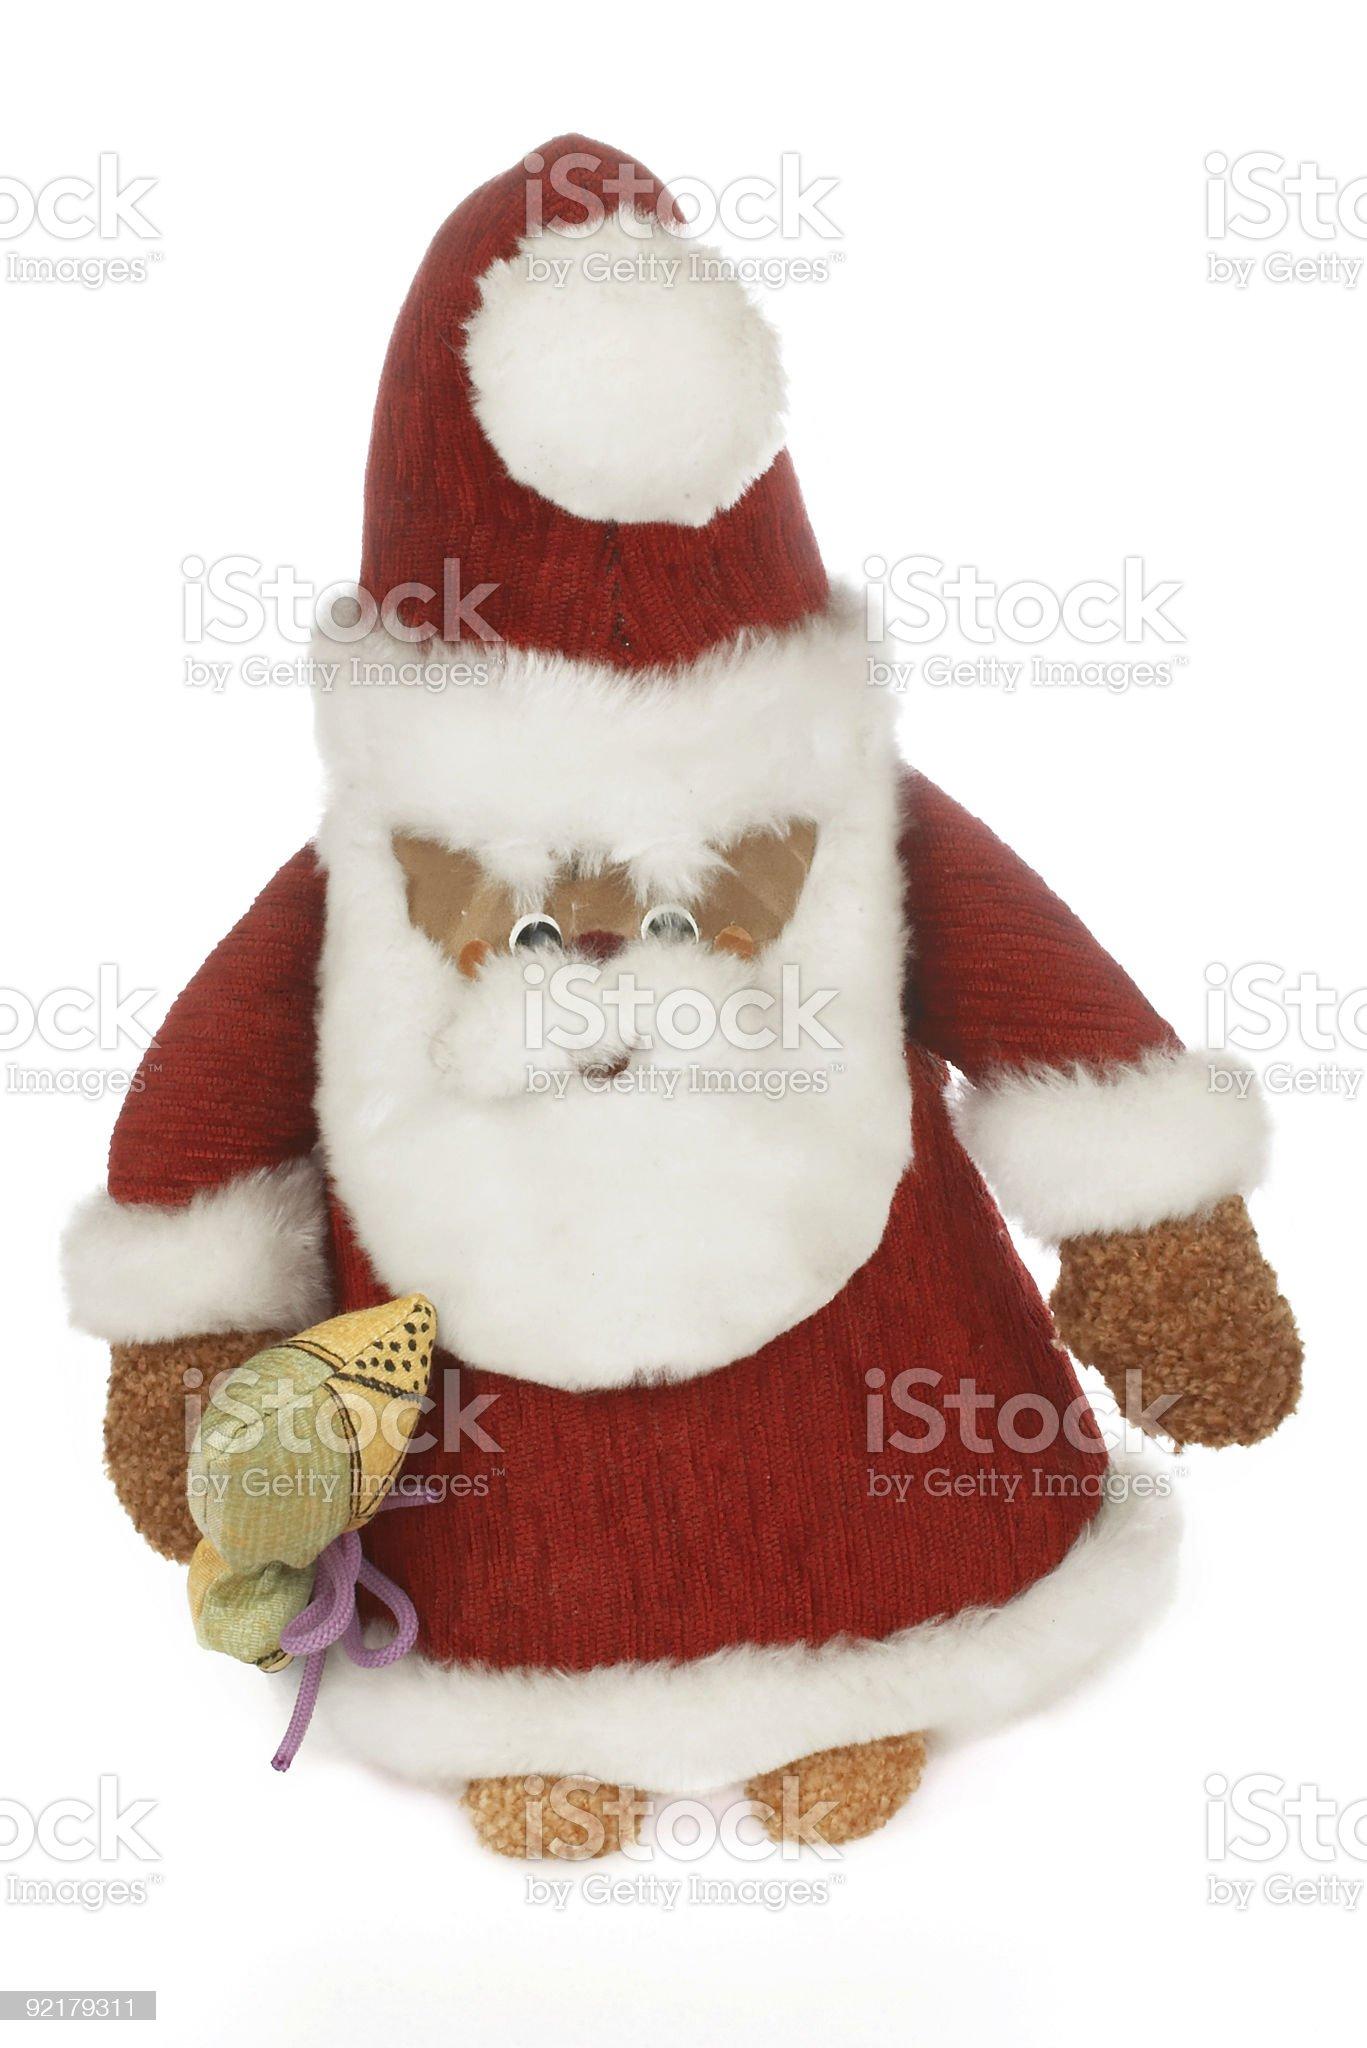 Santa Claus and his bag of goodies royalty-free stock photo